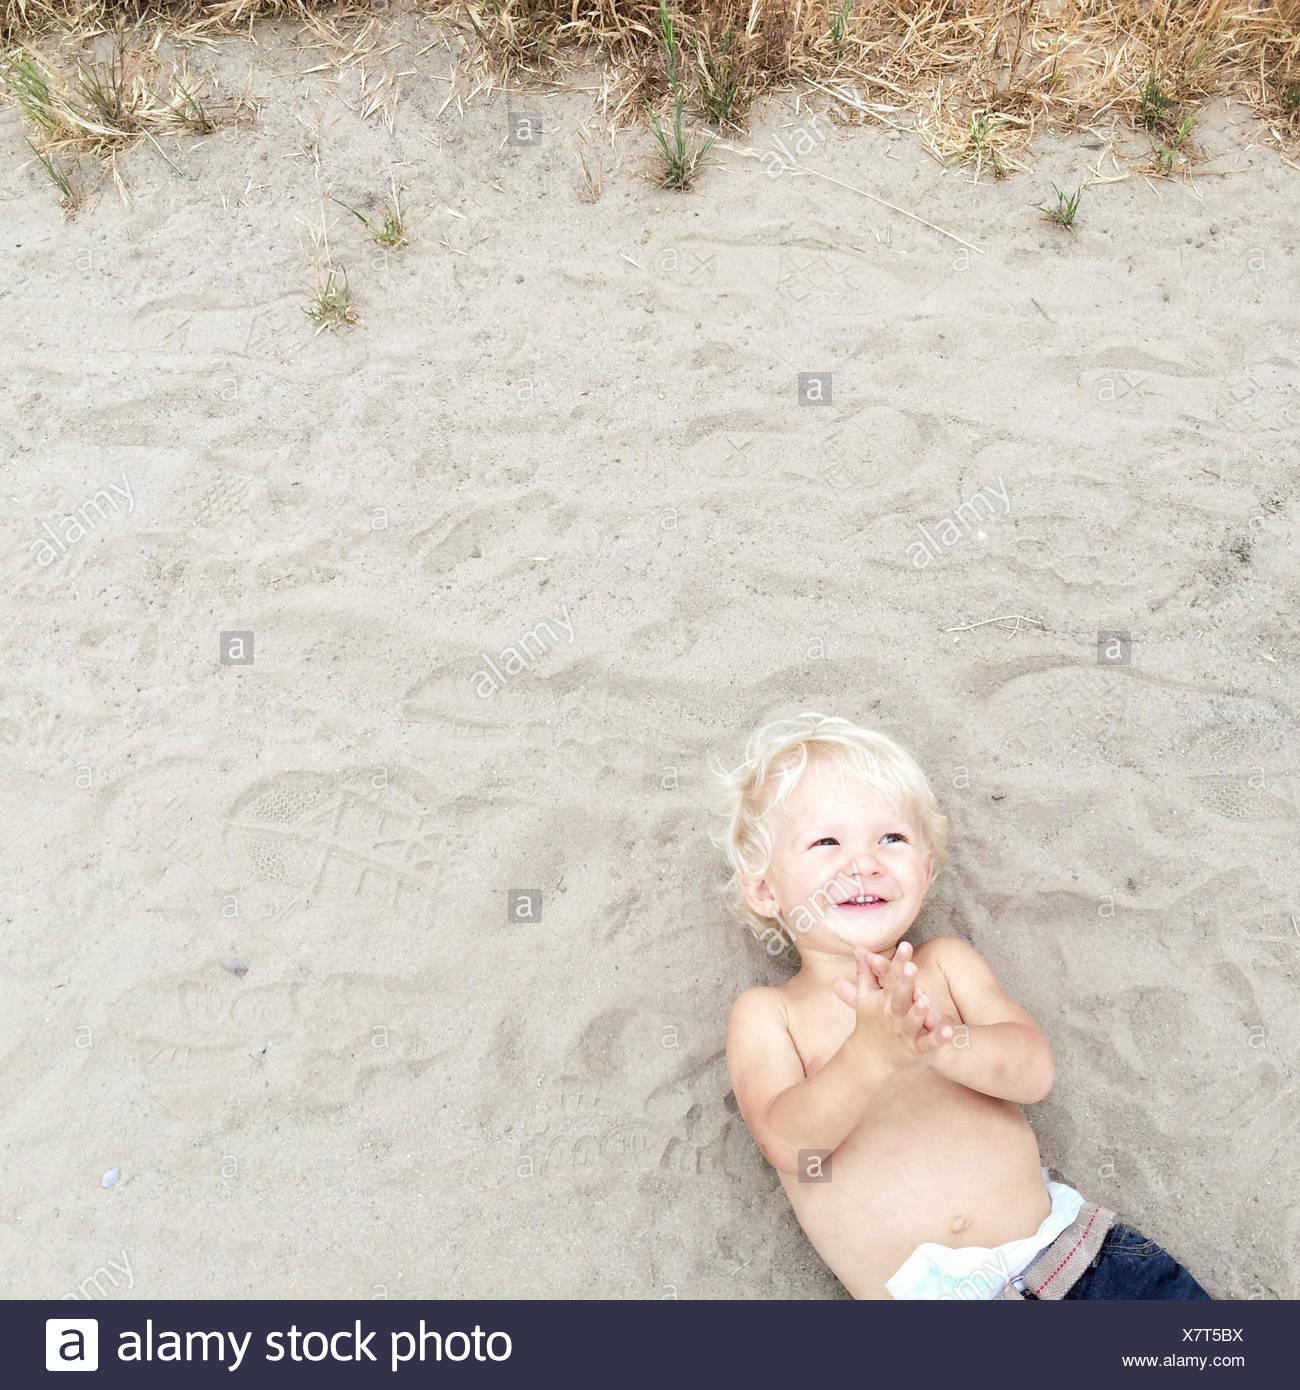 Overhead view of boy lying on beach - Stock Image